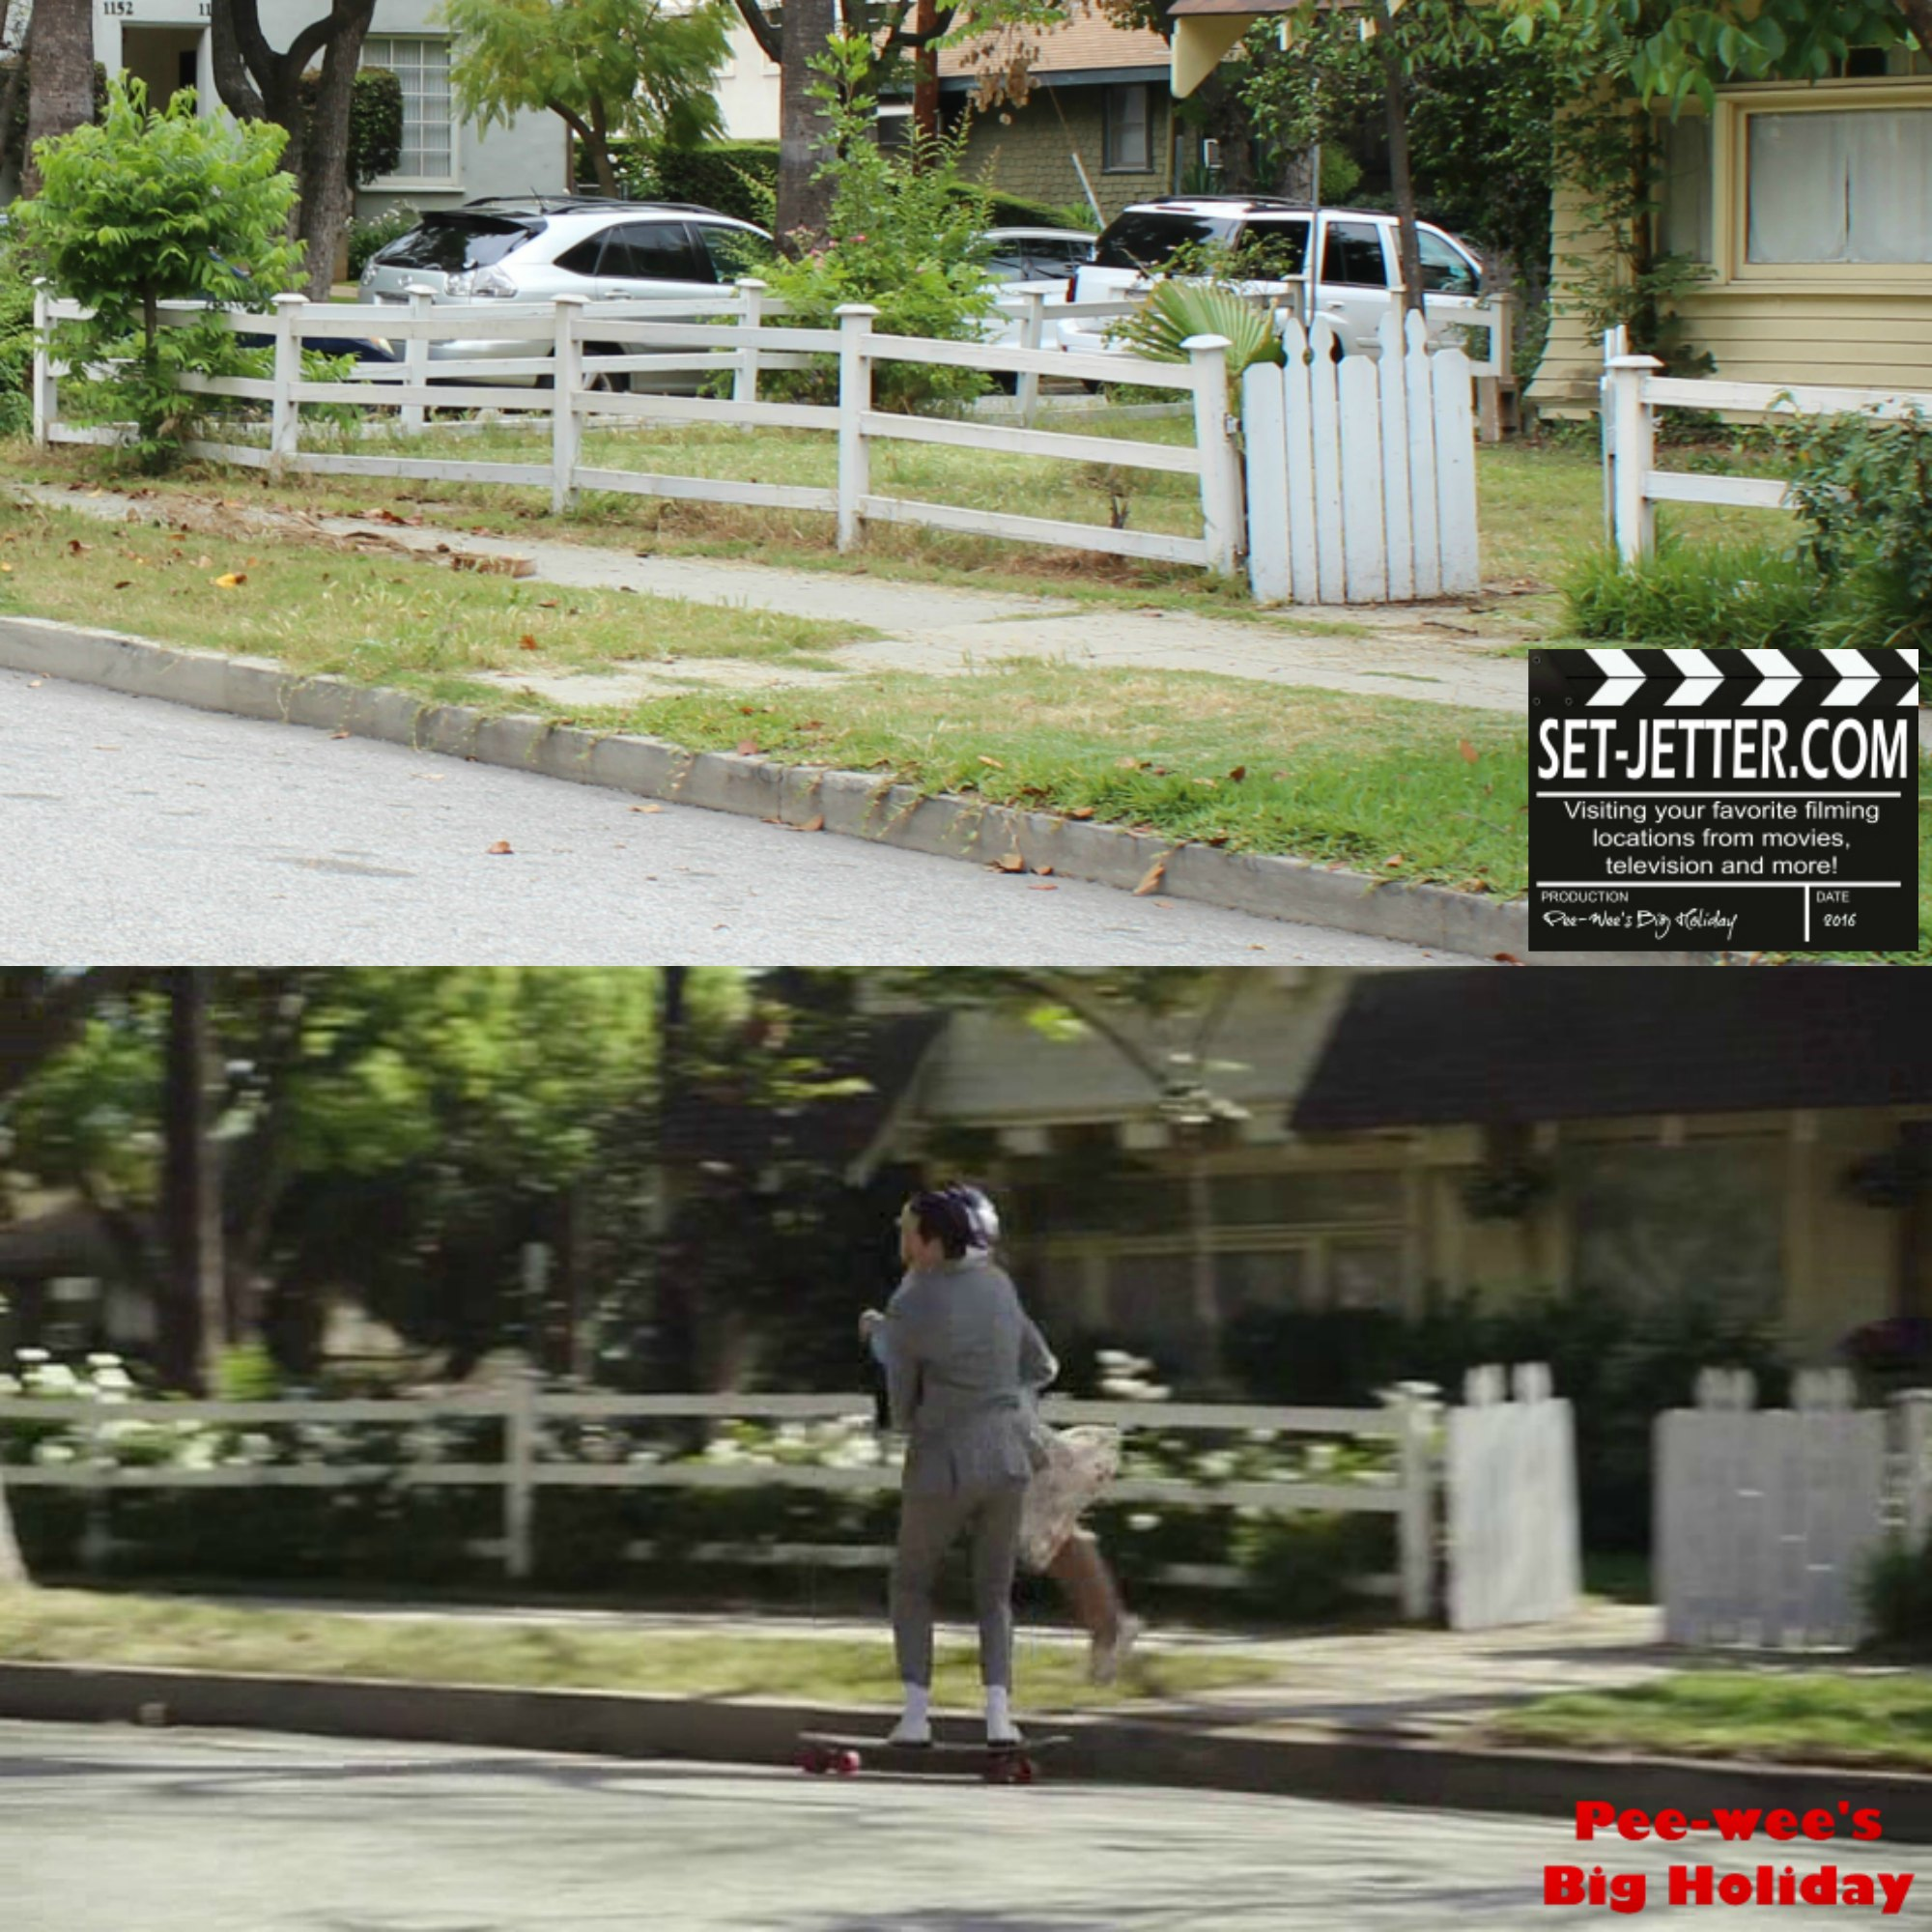 Pee Wee's Big Holiday comparison 226.jpg